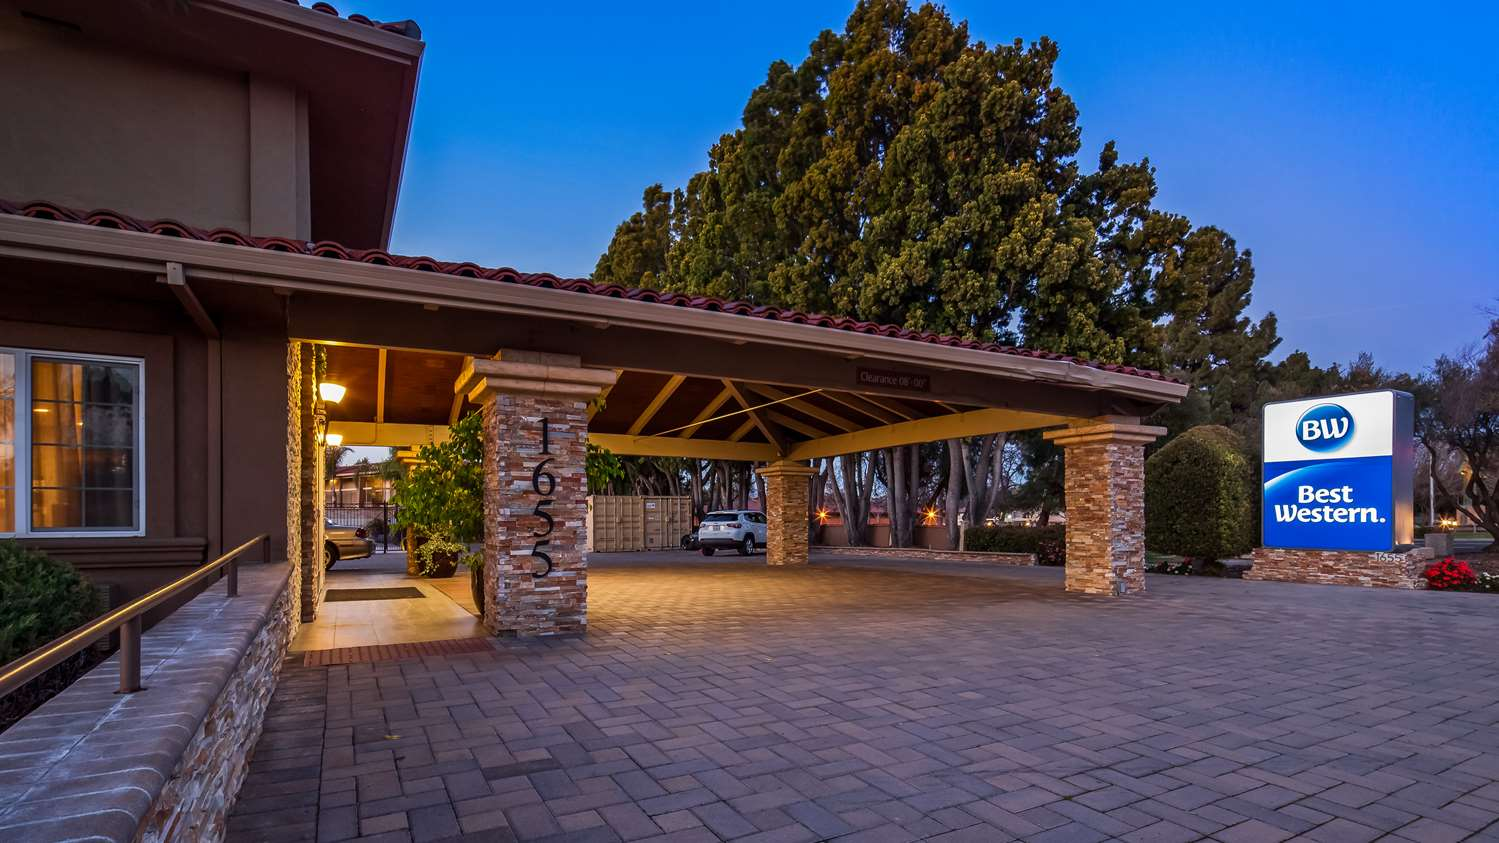 Best Western Santa Clara University Inn  Ca